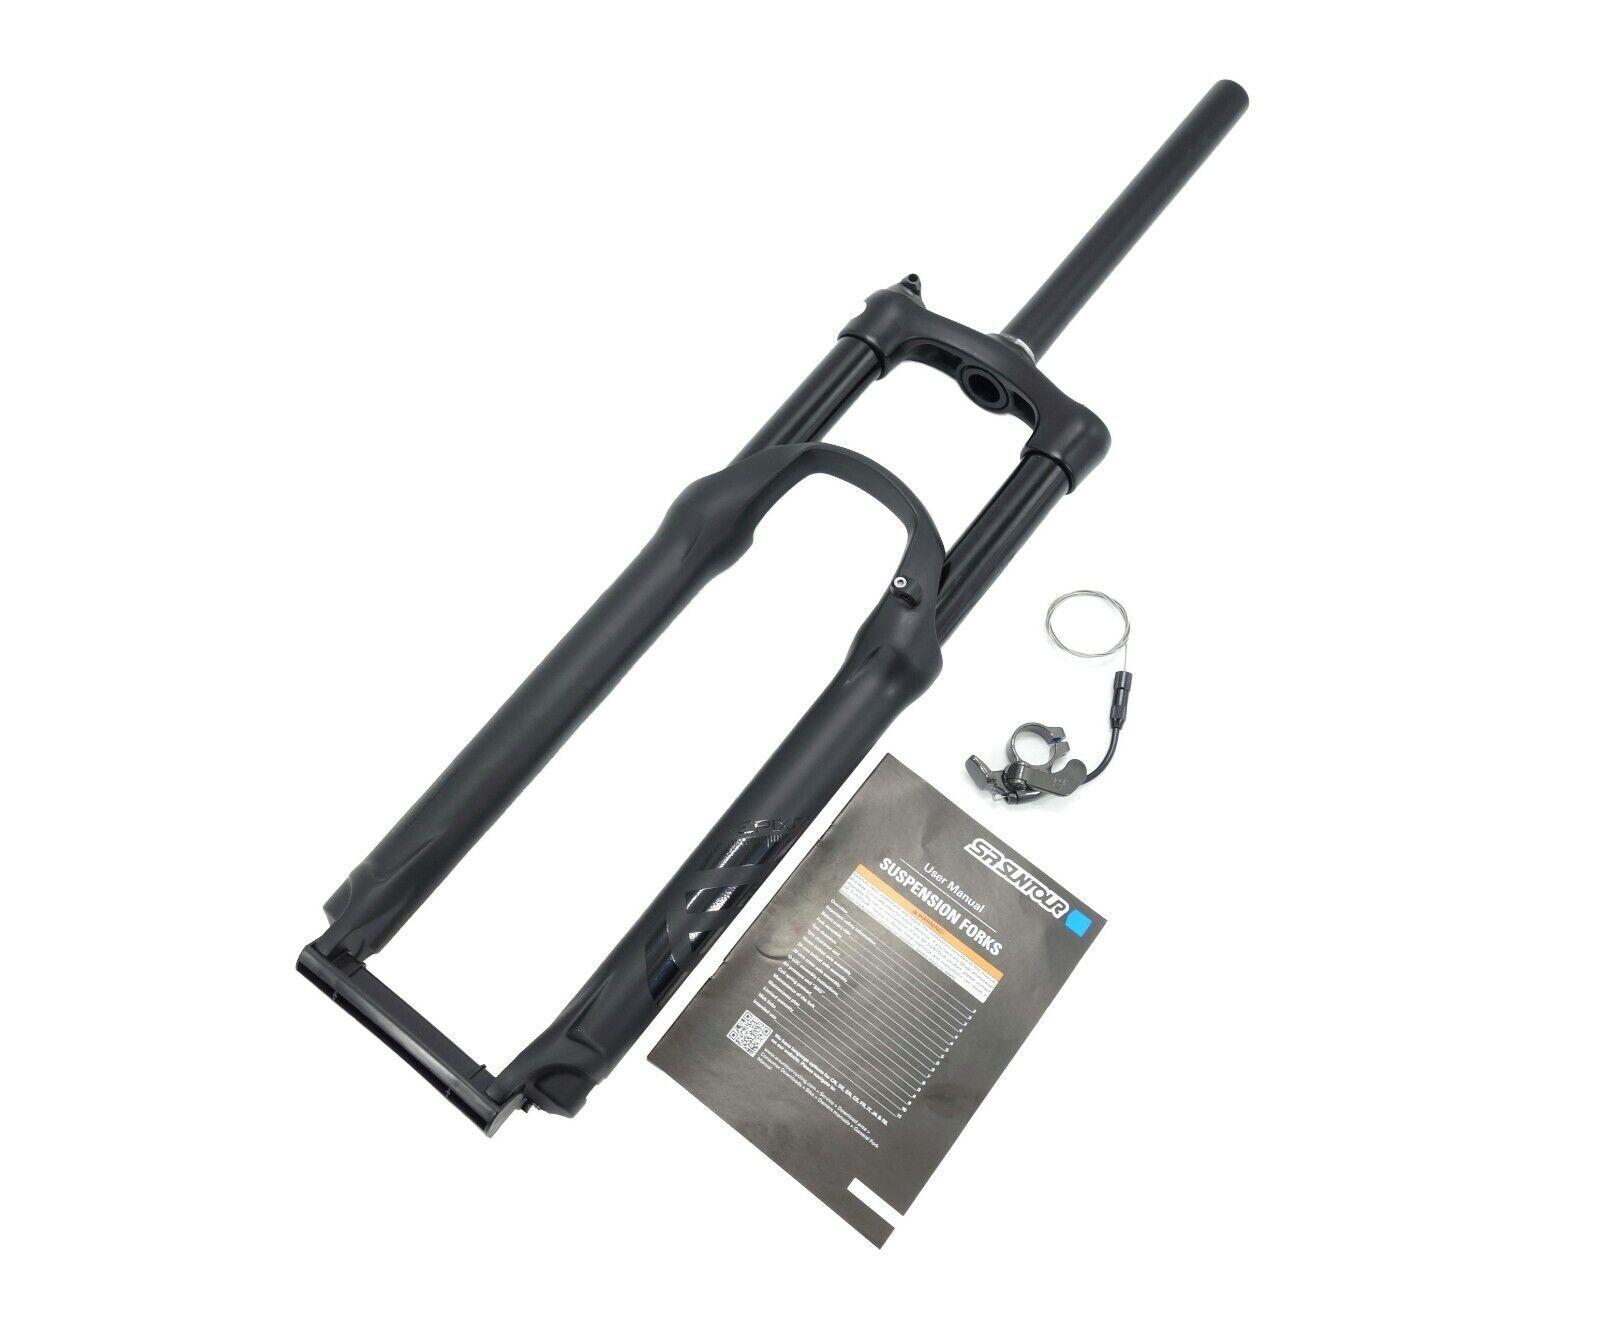 SUNTOUR New Epixon Remote Lock MTB XC DH Bike Fork 26